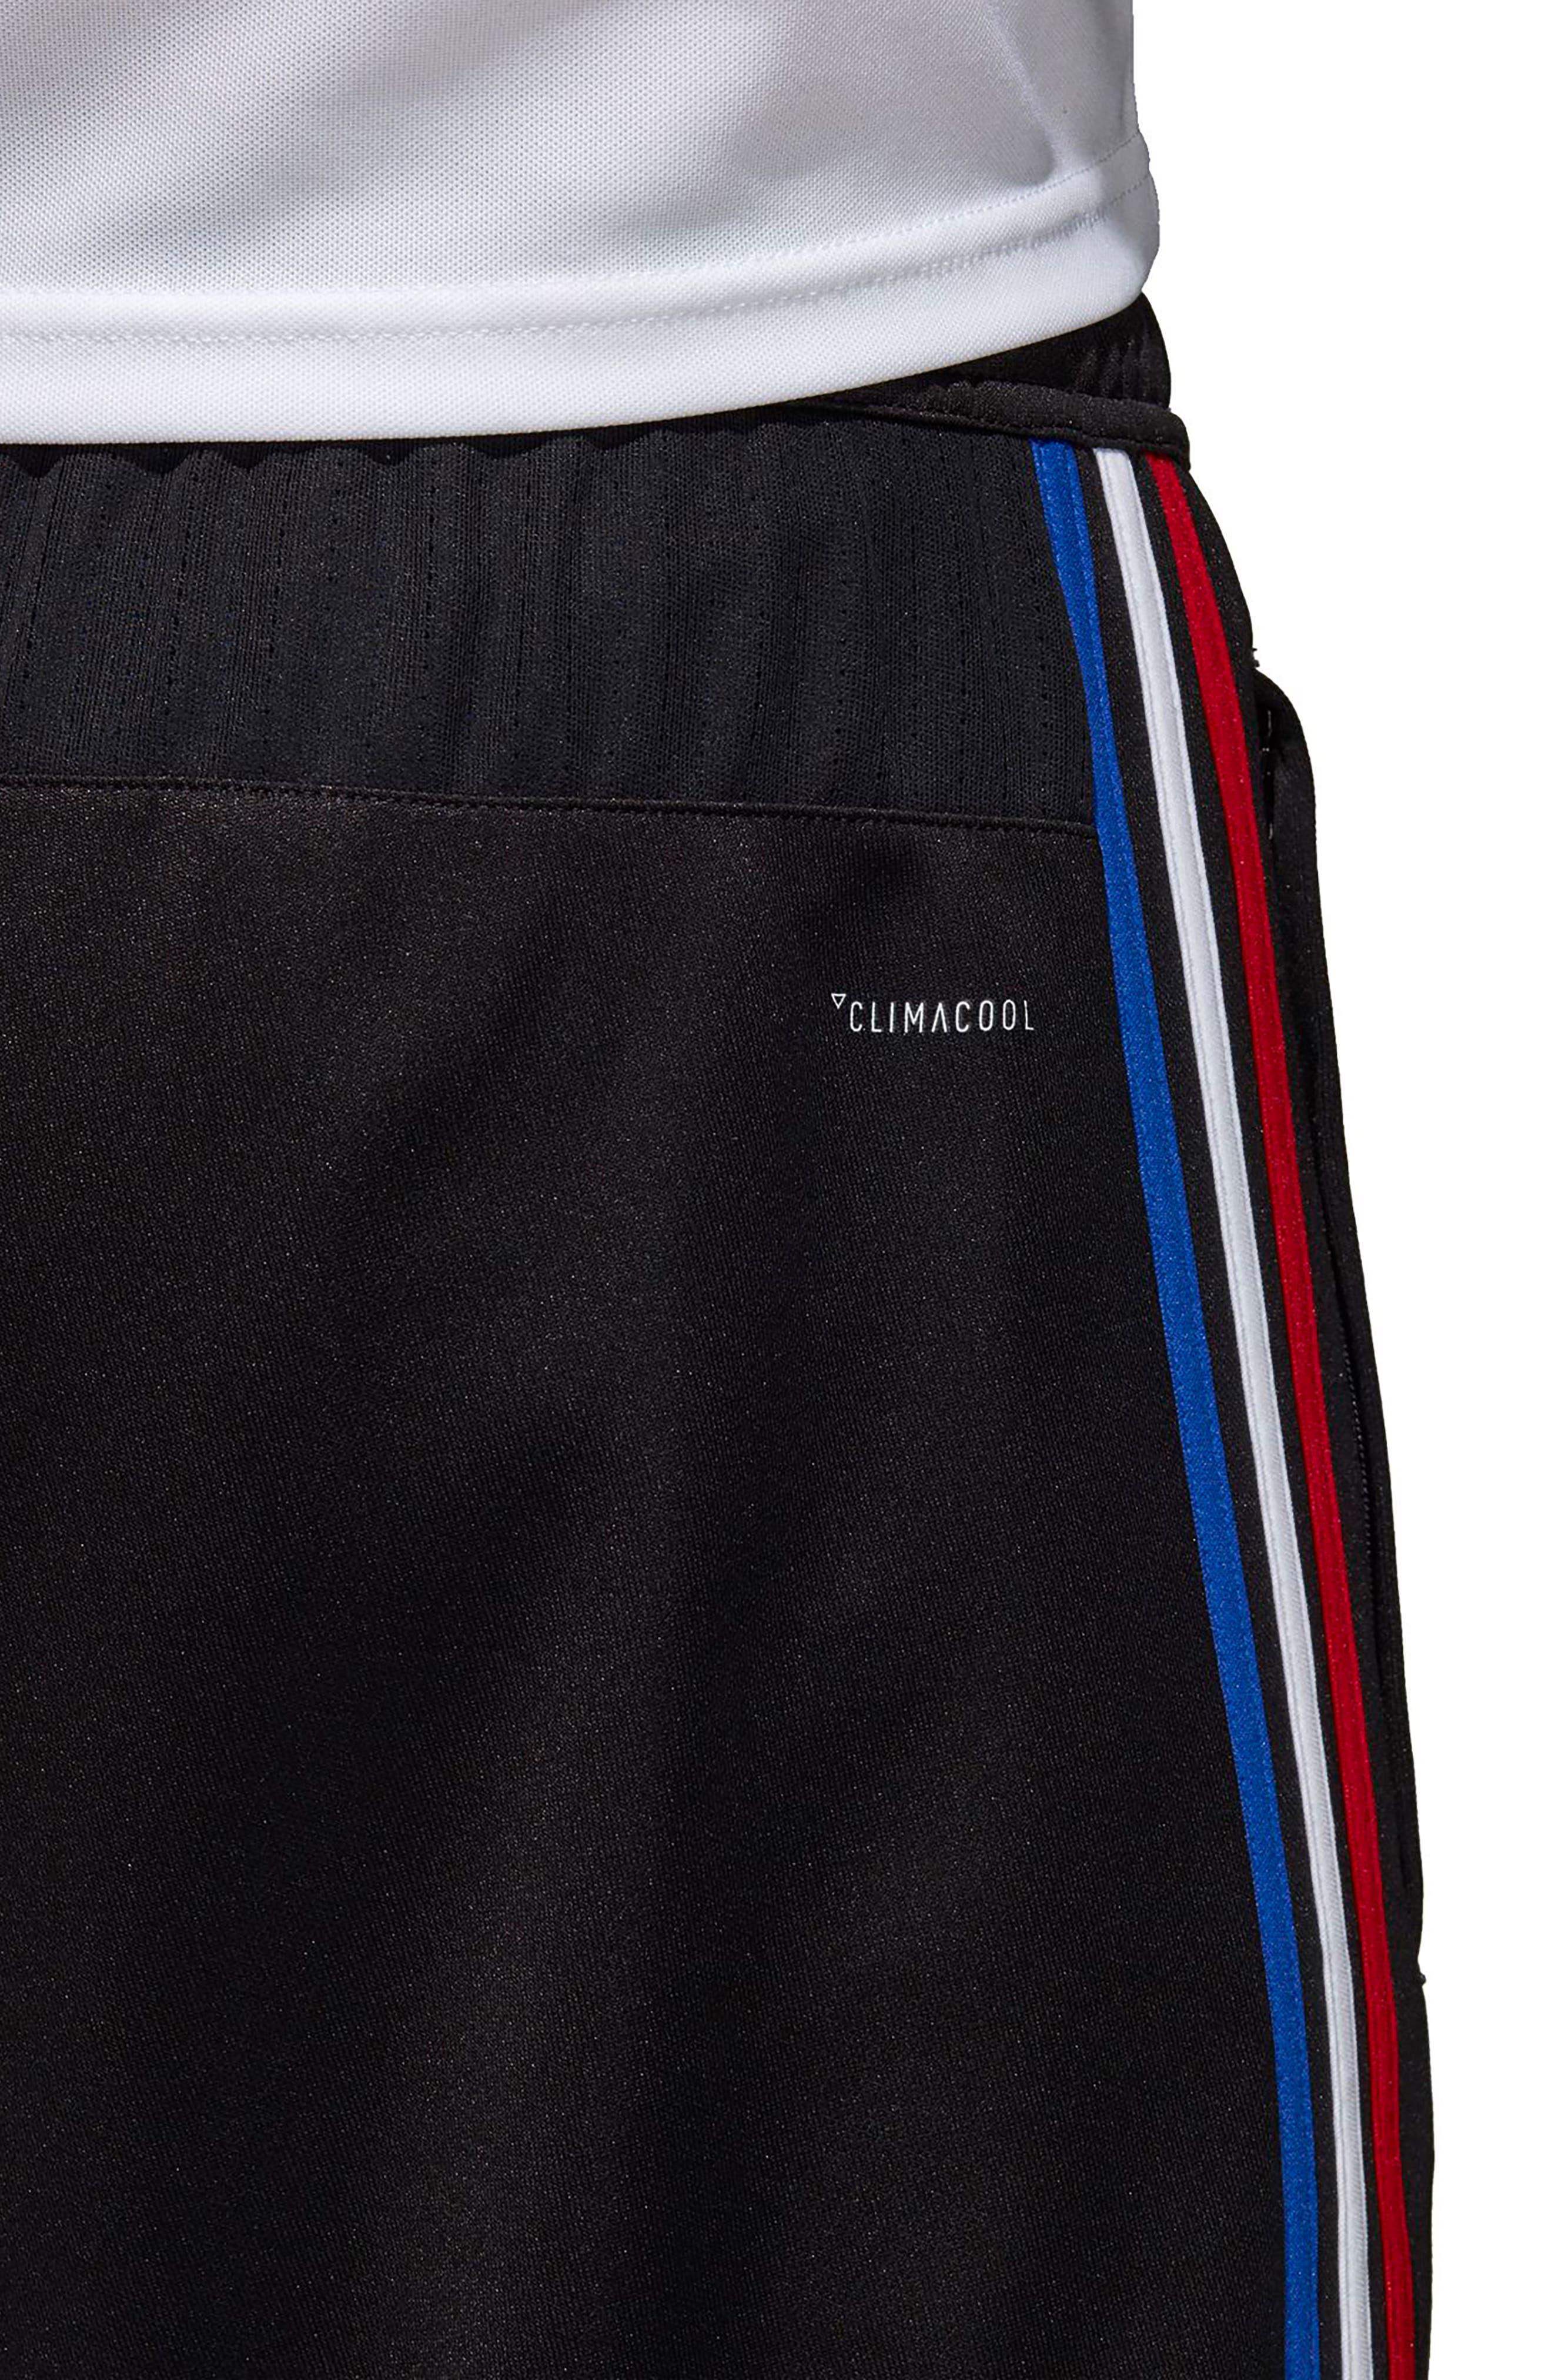 ADIDAS, Tiro 17 Regular Fit Training Pants, Alternate thumbnail 6, color, BLACK/ RED/ WHITE/ BLUE